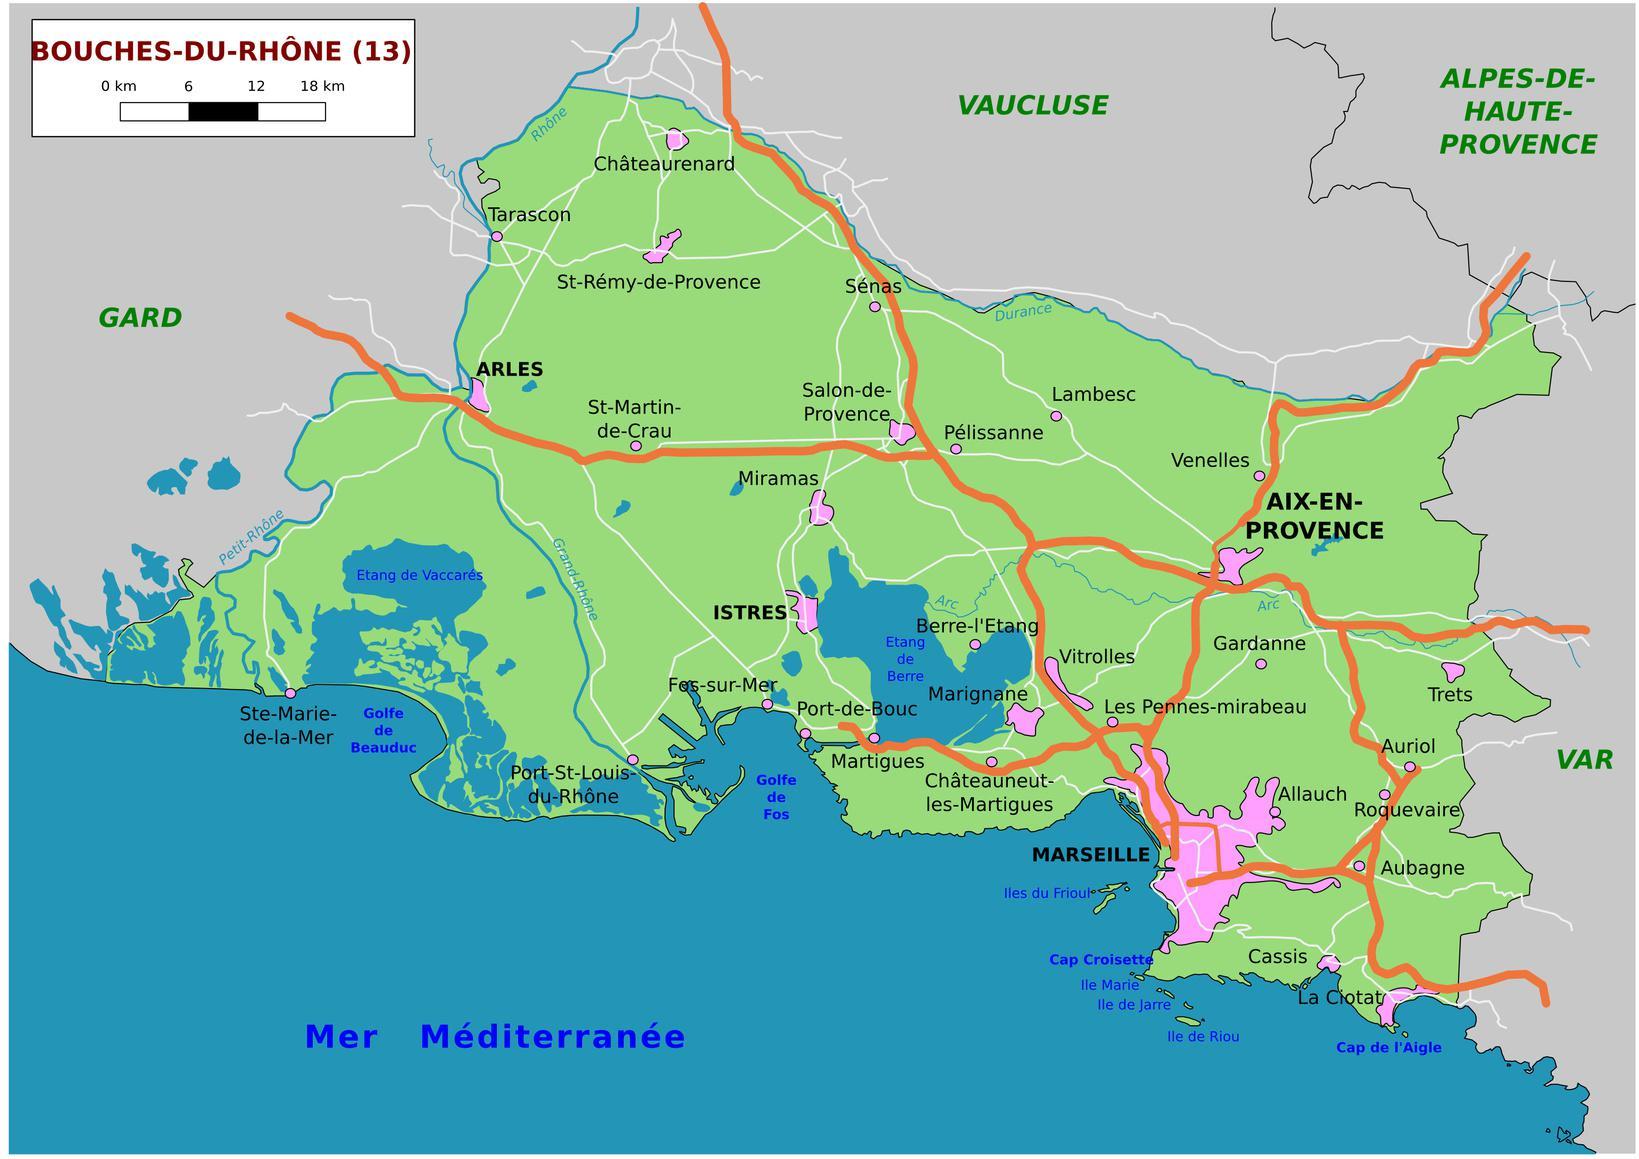 Carte des Bouches-du-Rhône